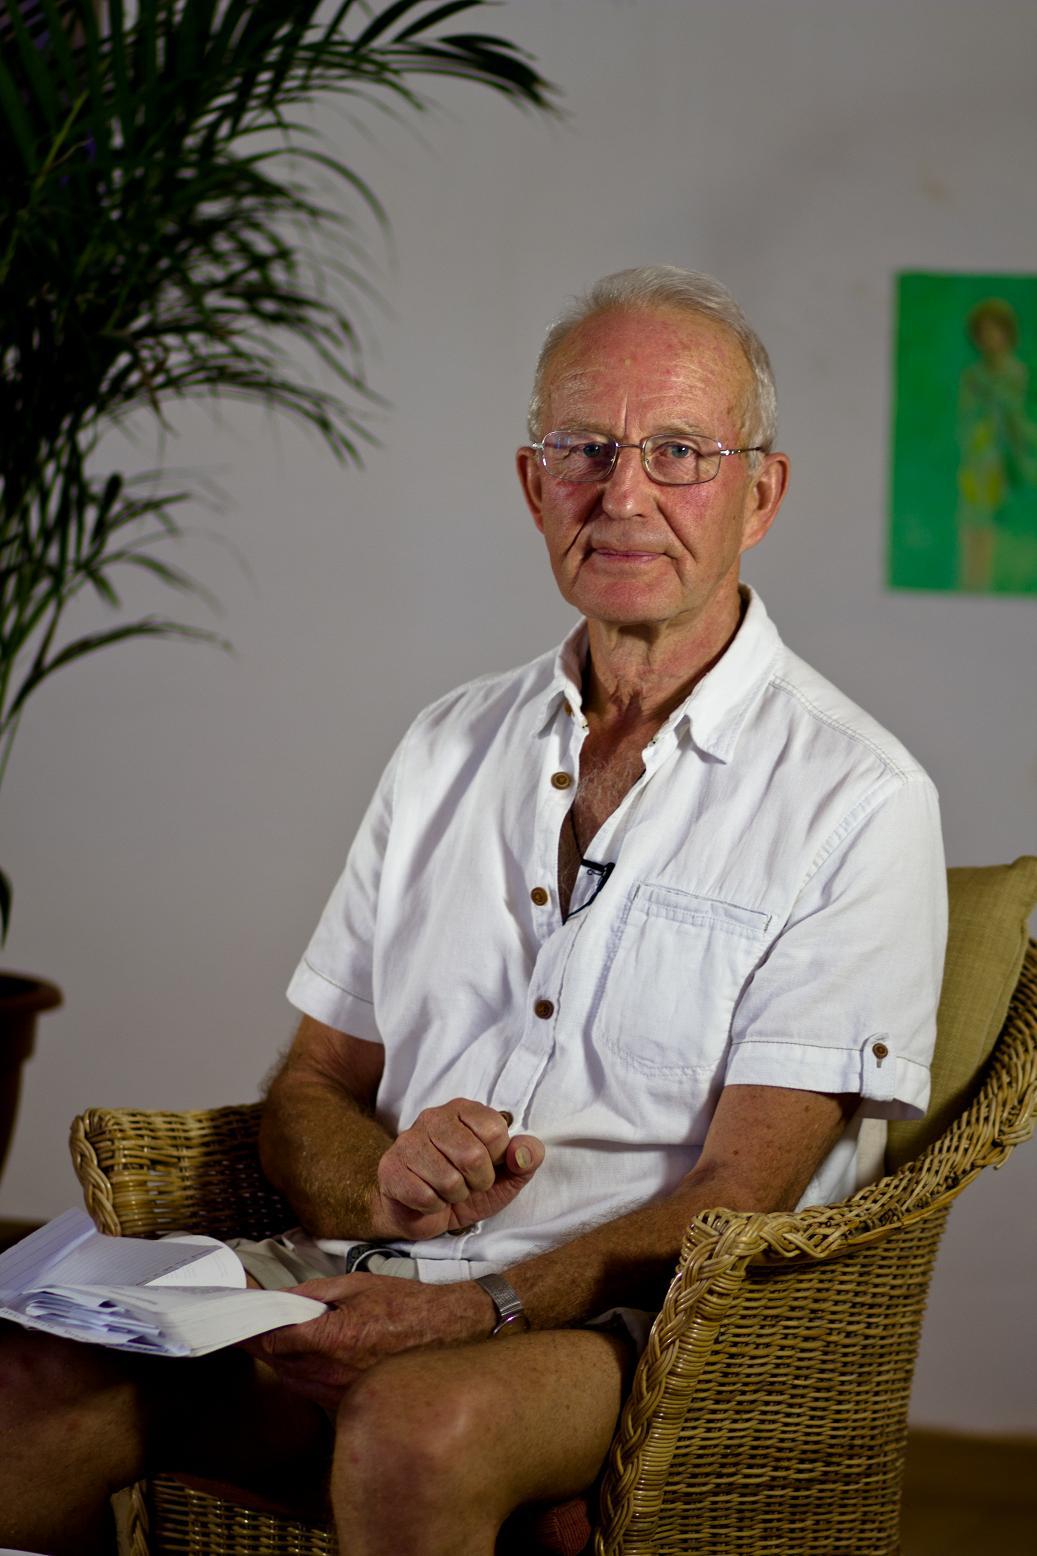 DOUGLAS CRAWFORD - DENMARK